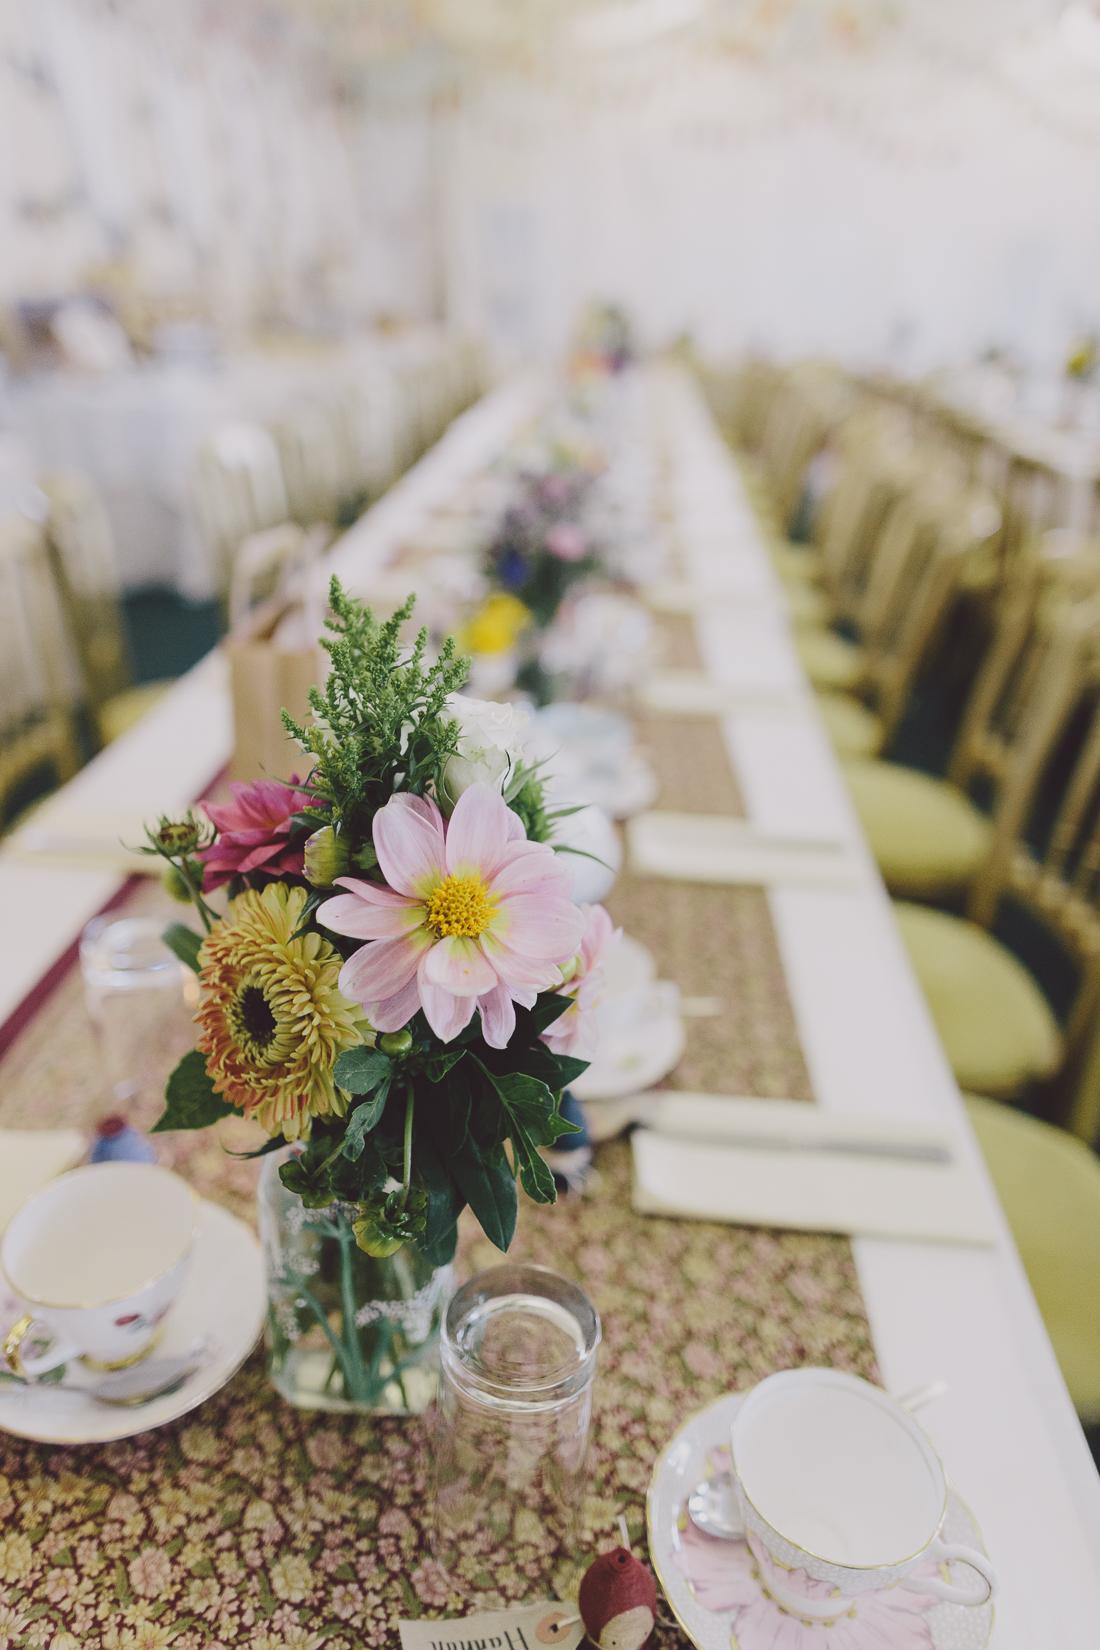 Flo + Ollie Tewkesbury Festival Wedding Scuffins Photography 060